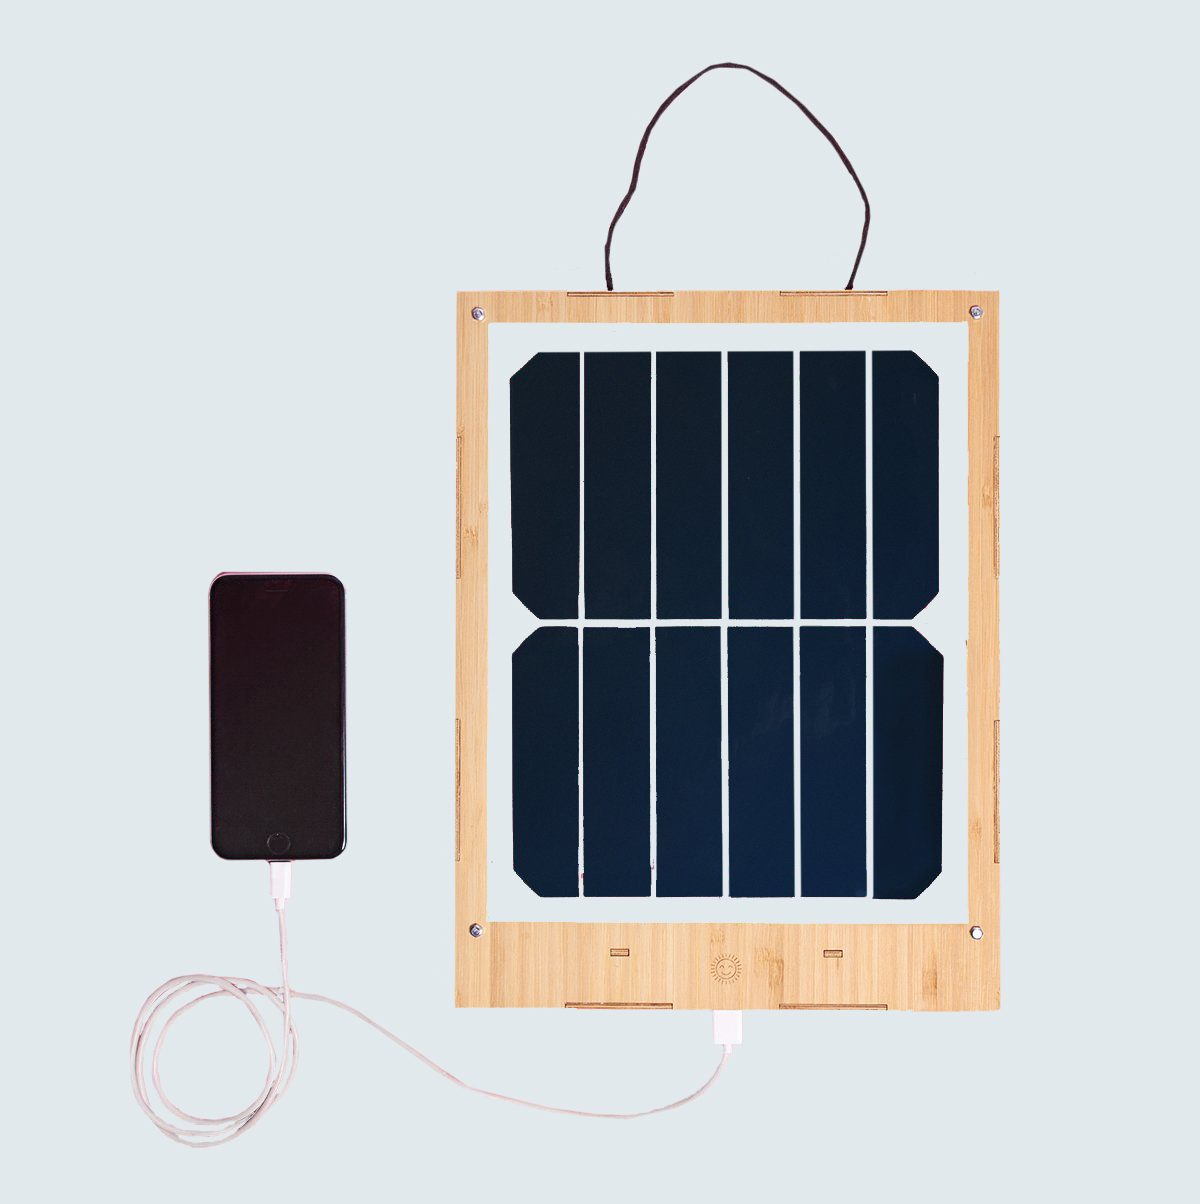 Grouphug Solar Charger